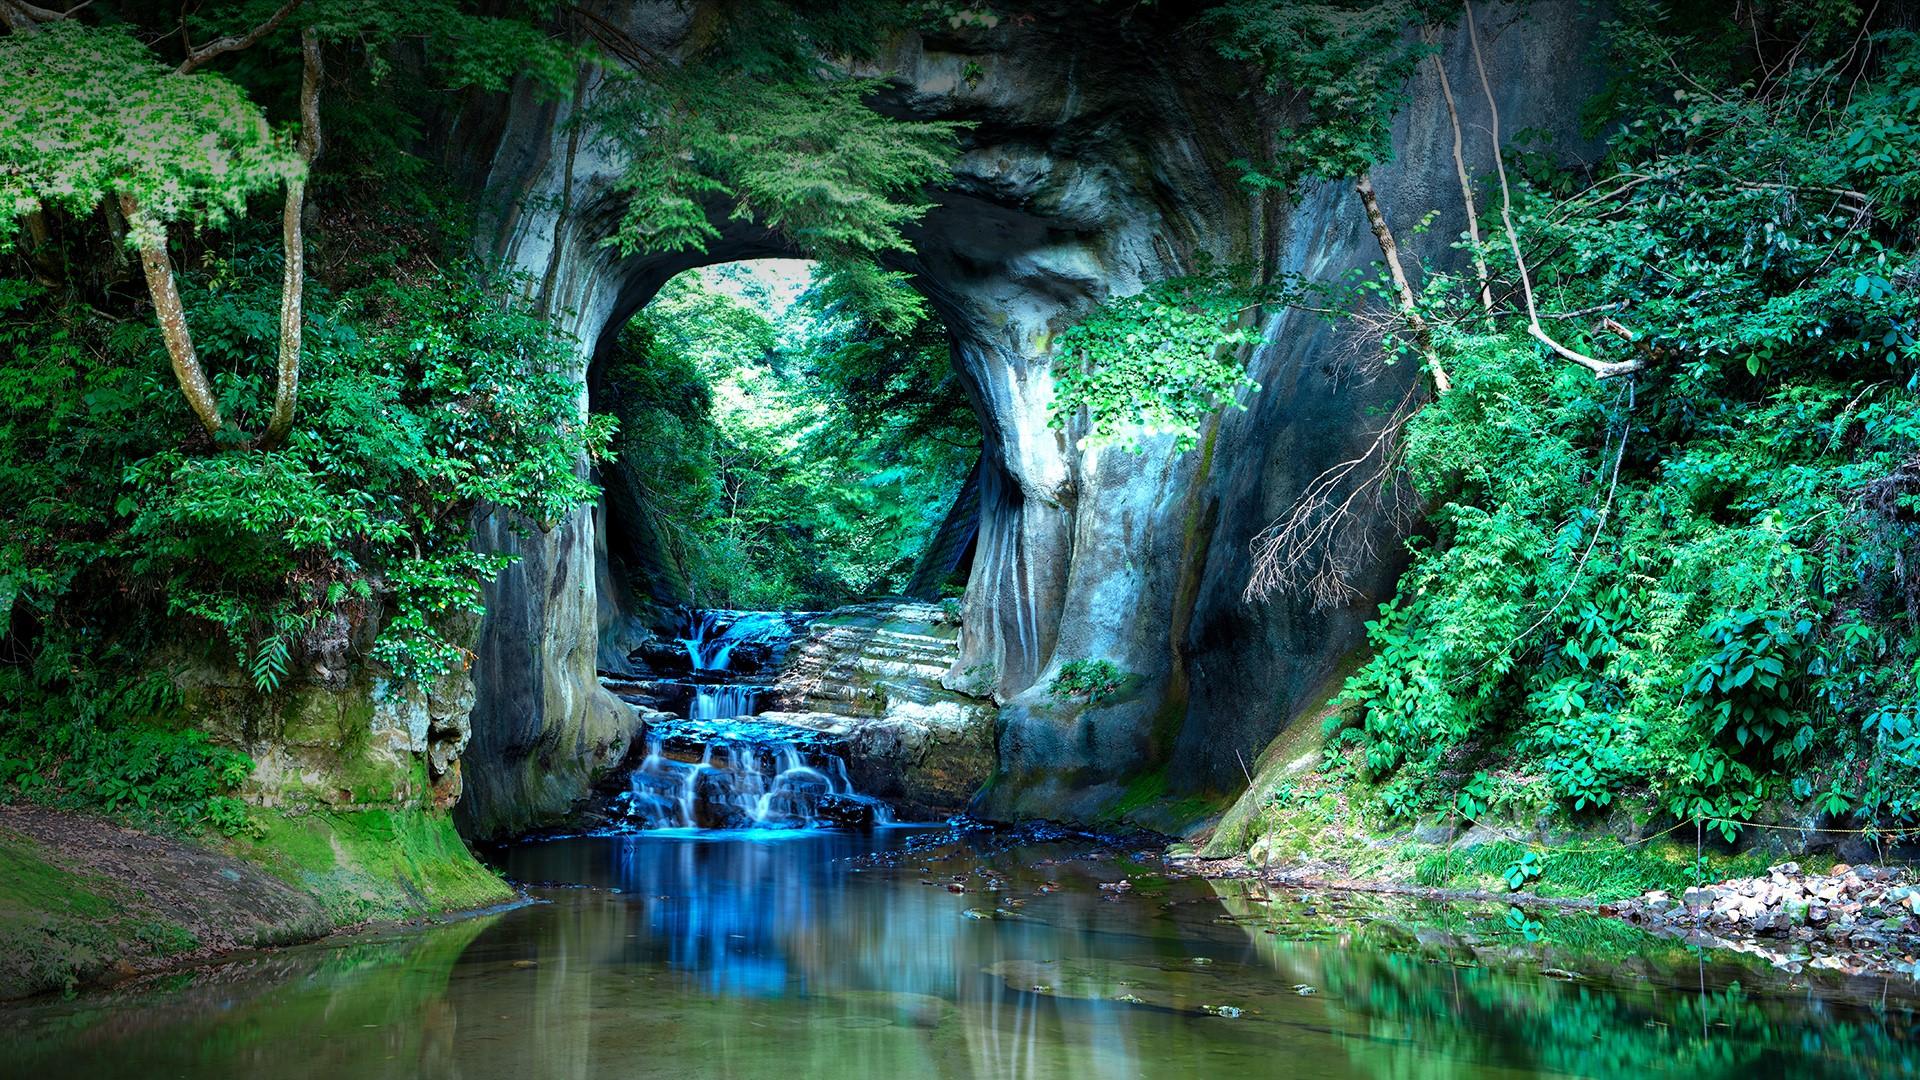 General 1920x1080 nature landscape cave river water trees rocks plants forest Japan Kameiwa Cave